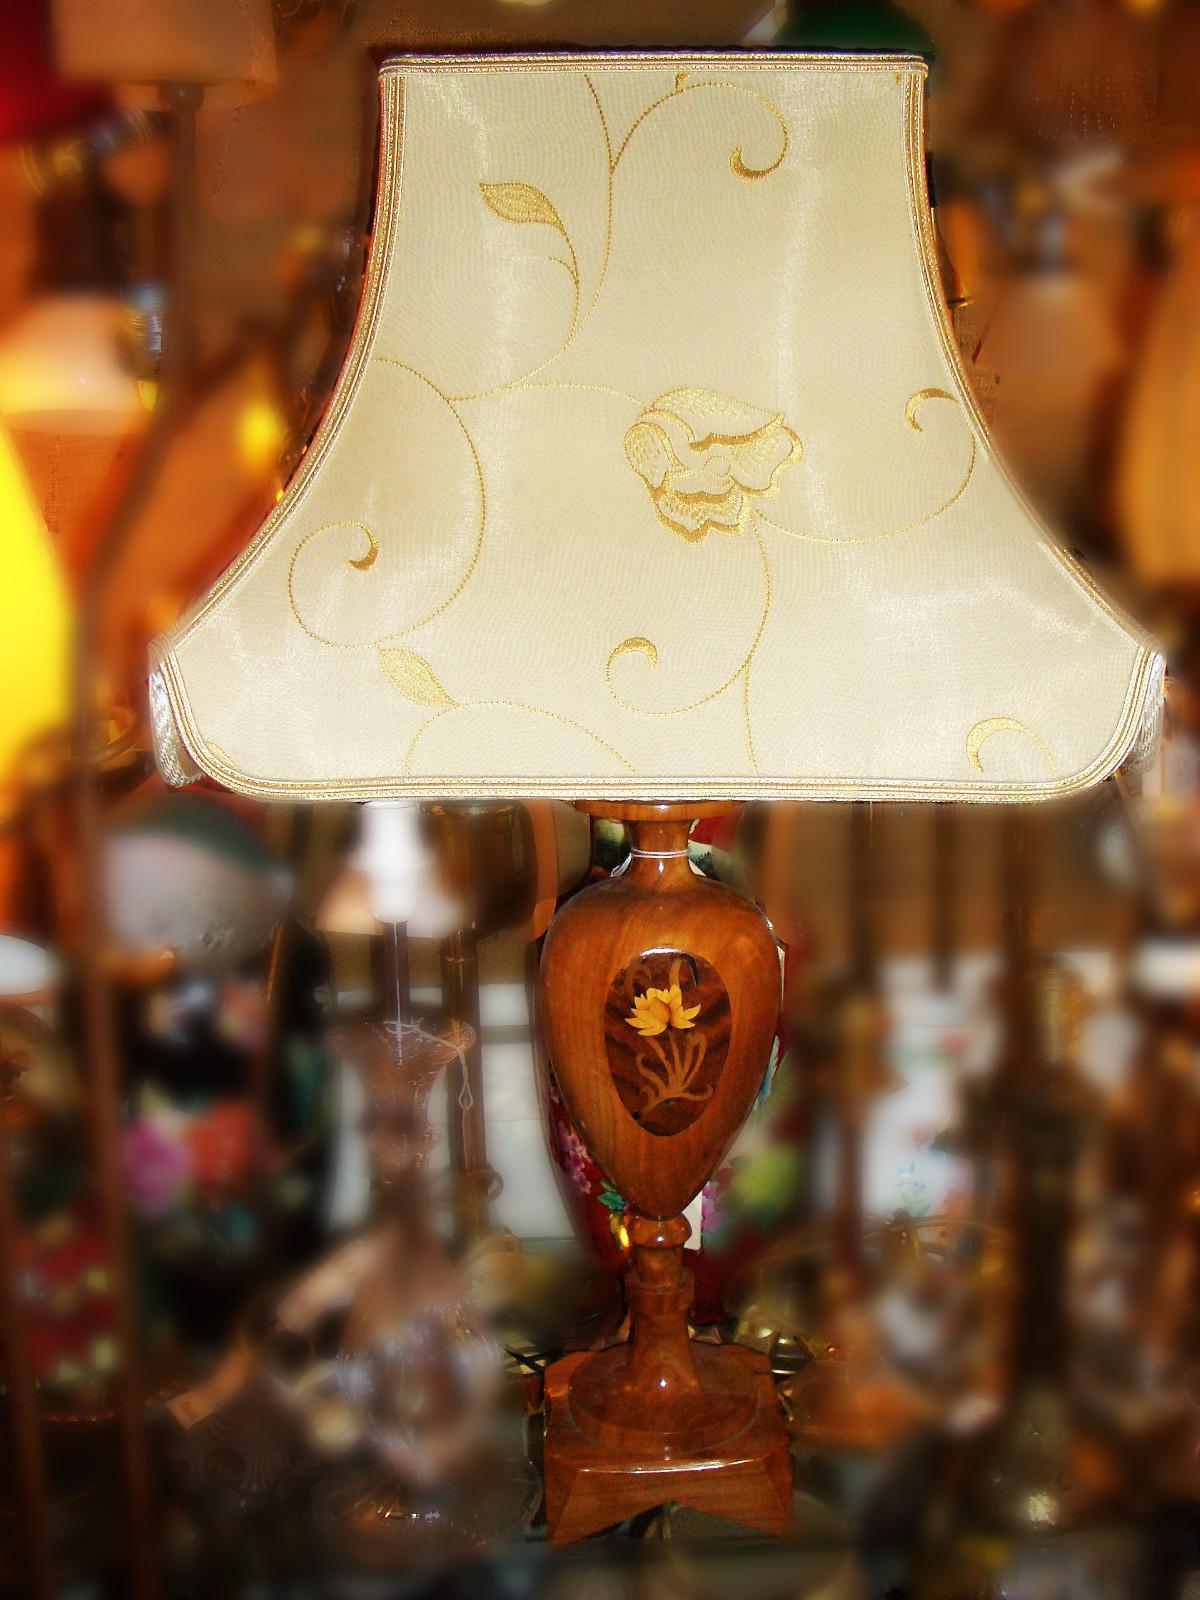 Bottega Illuminazione OffertePiccola Illuminazione OffertePiccola OffertePiccola OffertePiccola OffertePiccola Illuminazione Bottega Illuminazione Illuminazione OffertePiccola Bottega Bottega Bottega OnPk80wX